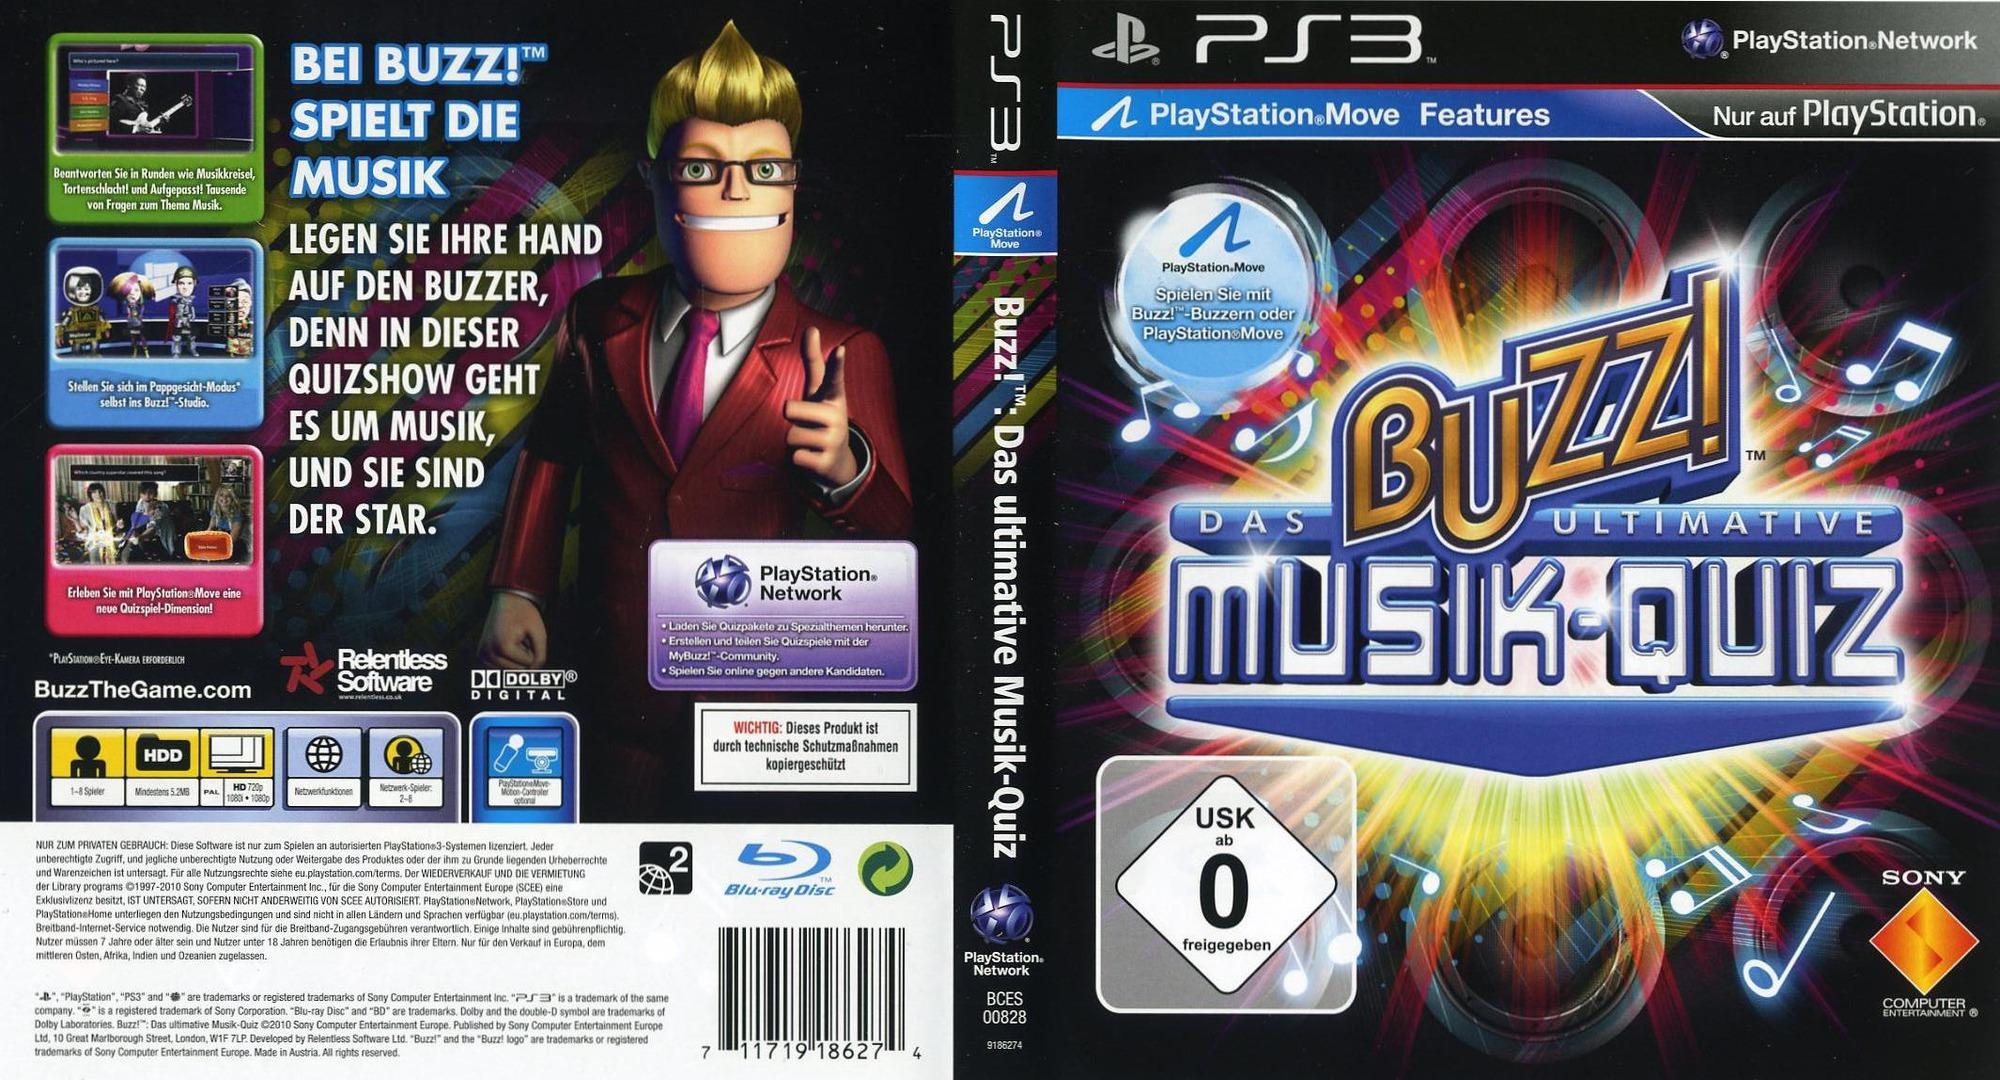 Buzz! Das Ultimative Musik Quiz PS3 coverfullHQ (BCES00828)